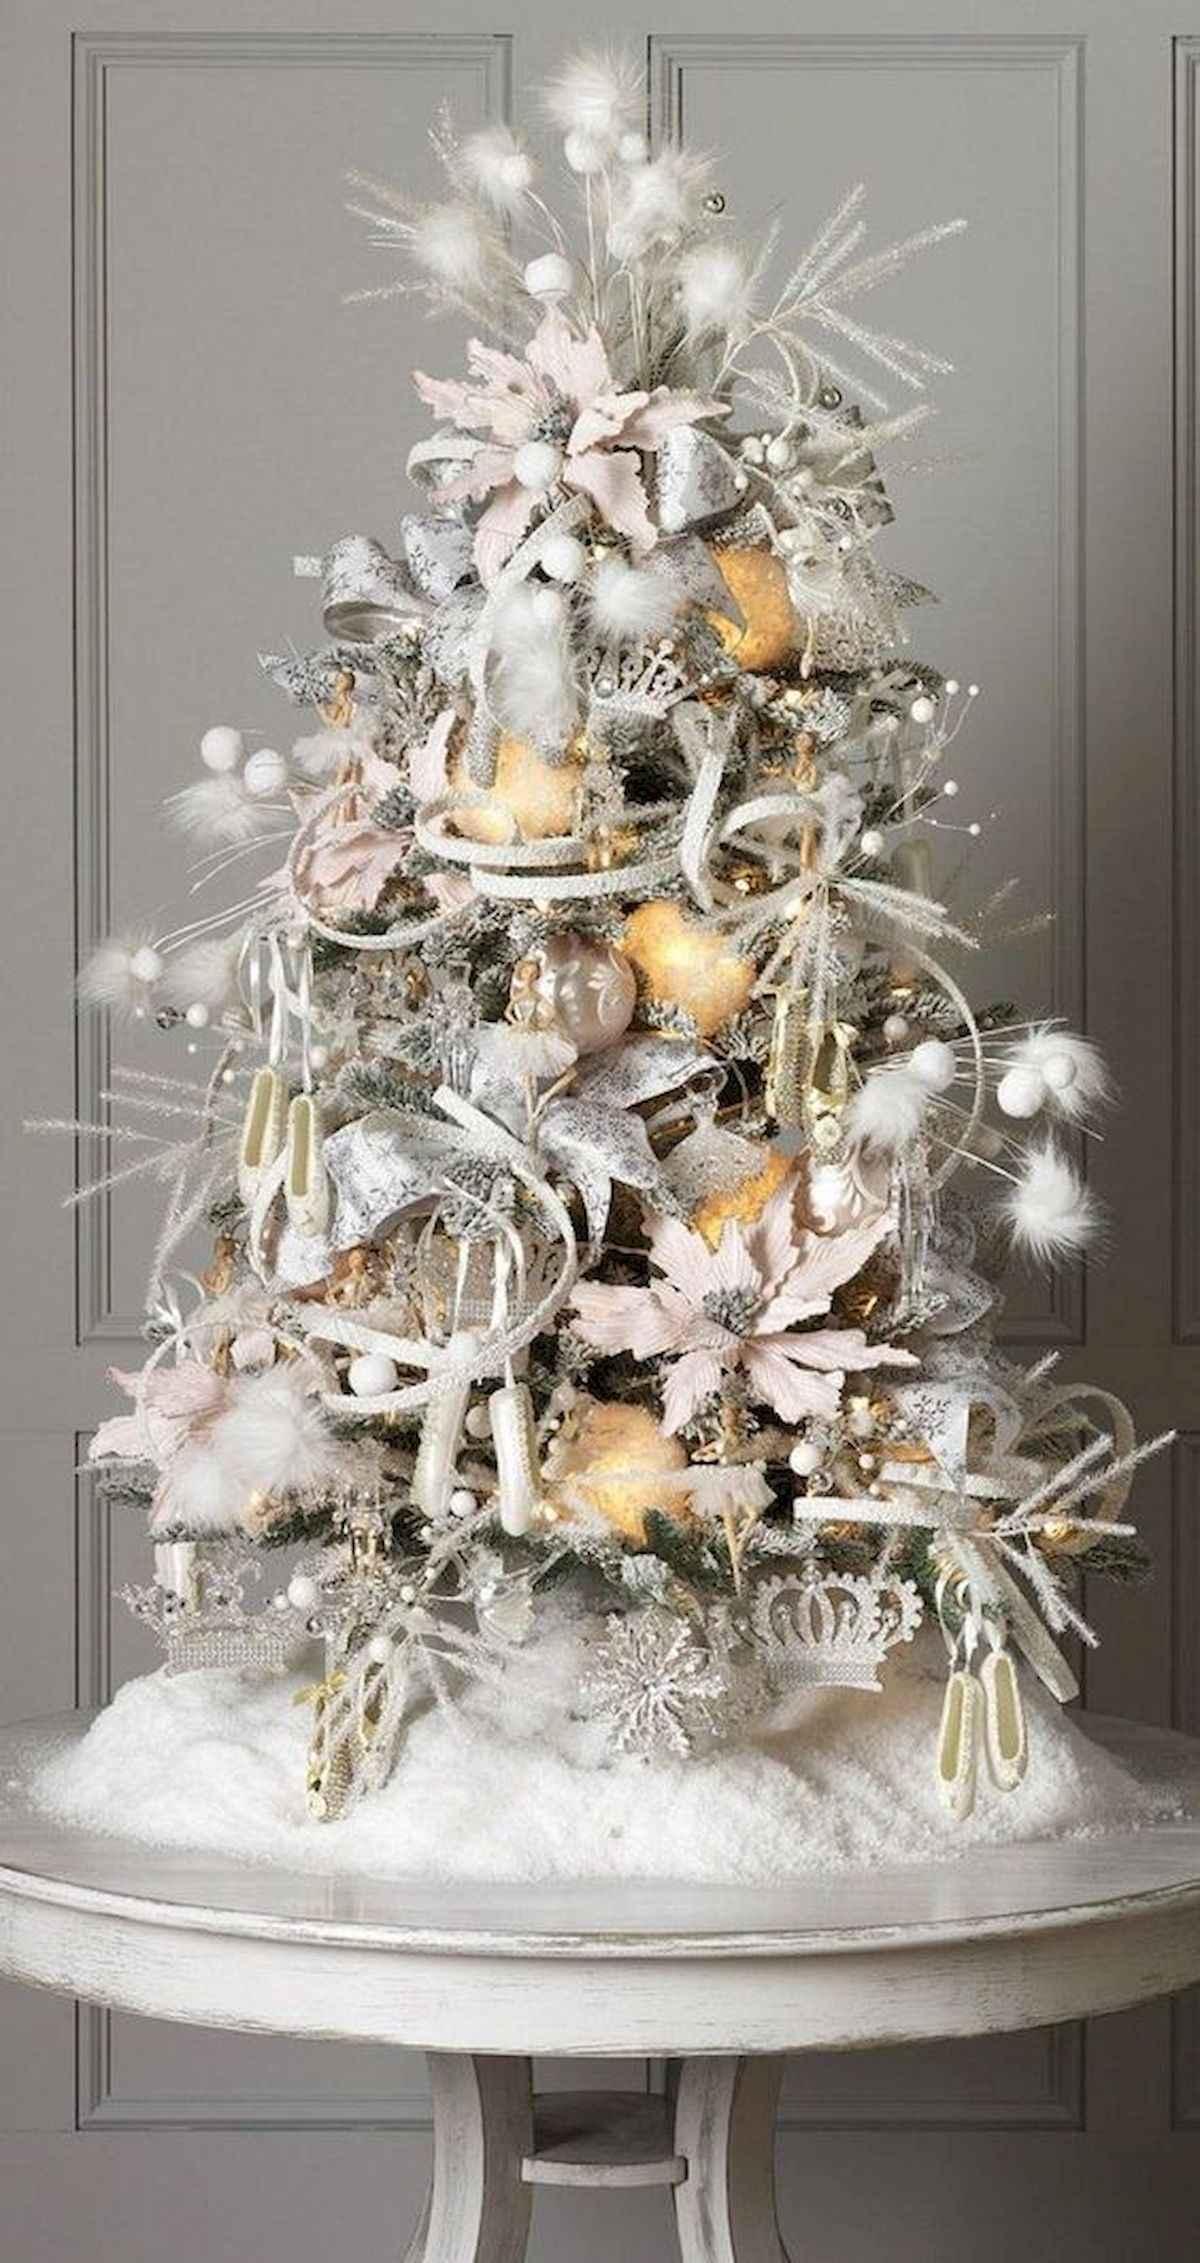 40 elegant christmas tree decorations ideas (38)